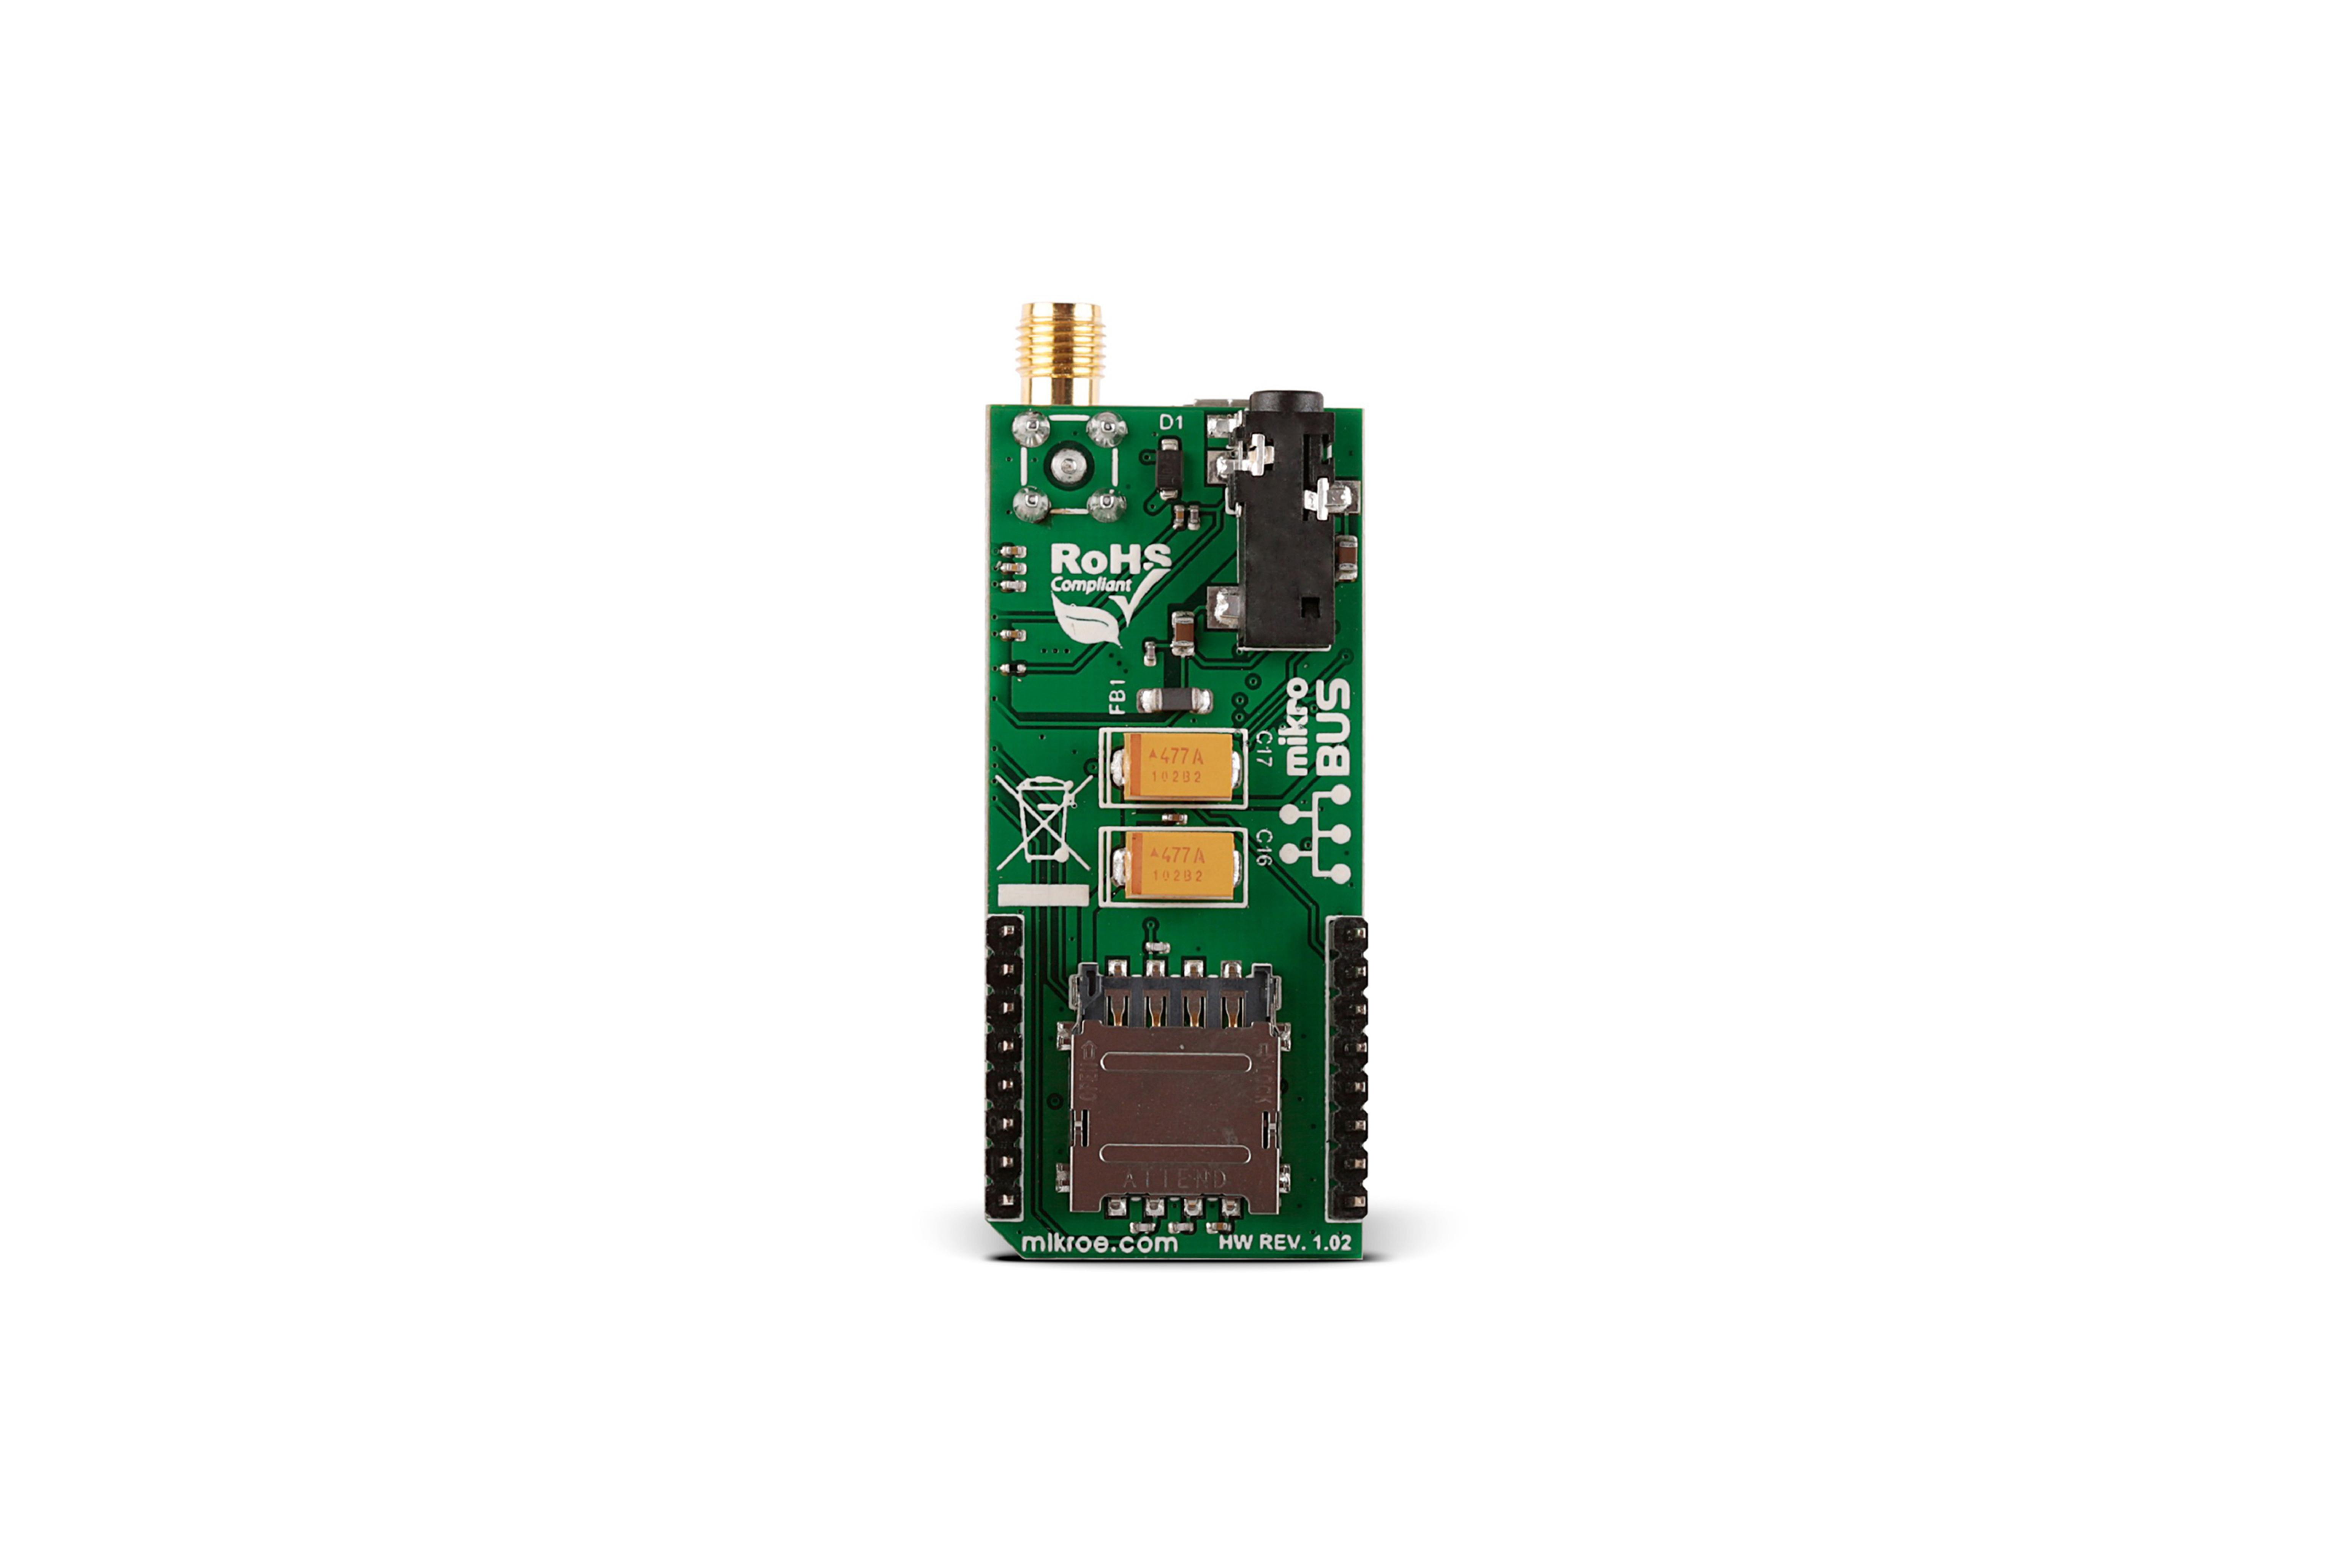 GSM 4 CELLULAR-CLICK-PLATINE, MIKROE-2388